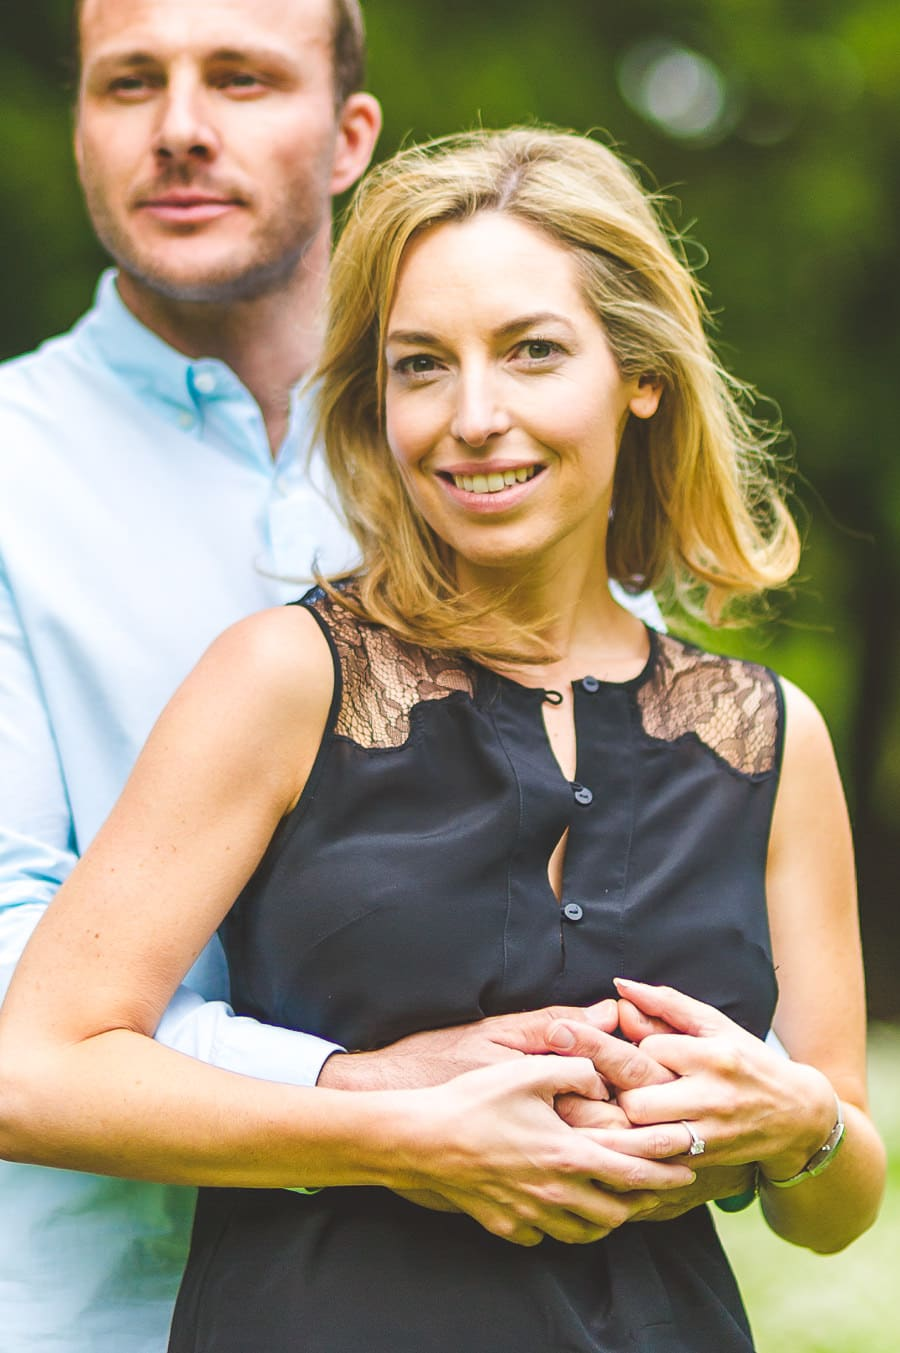 Louise & Nick's Pre Wedding Photography @ Eastnor Castle Ledbury | Herefordshire Photographers 8